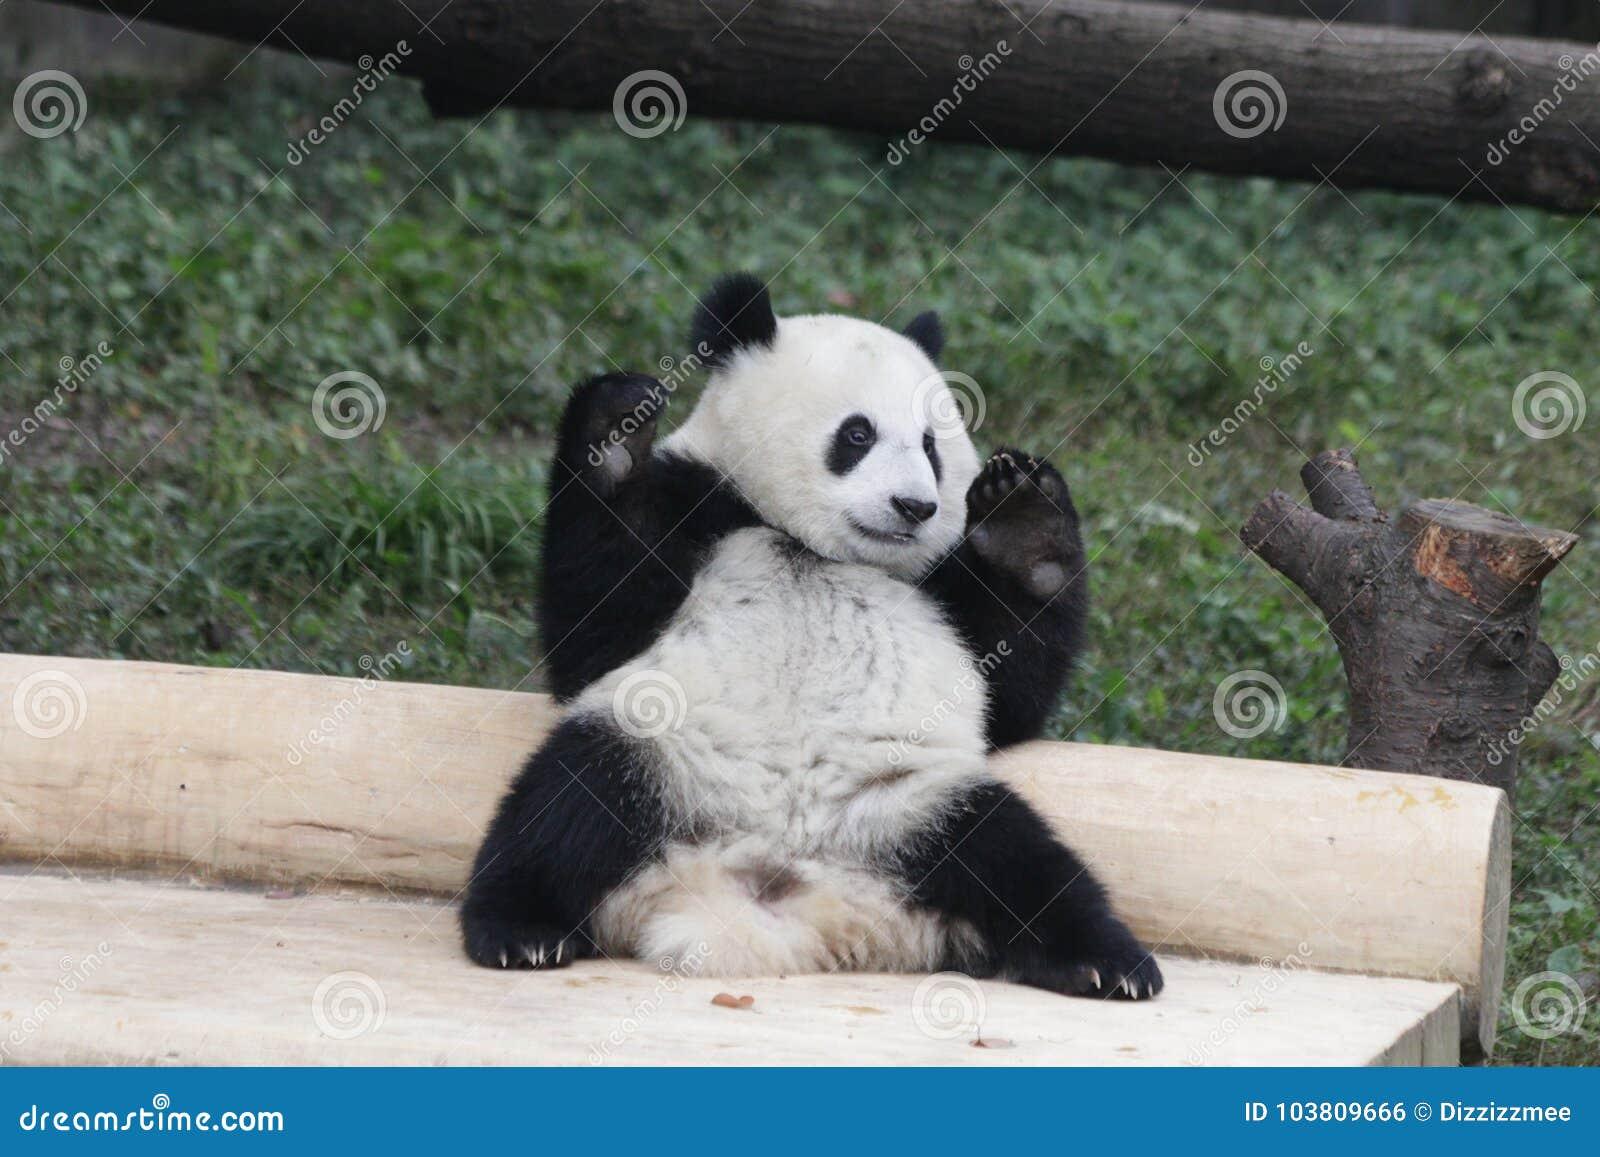 Panda Cubs juguetón en Chongqing, China